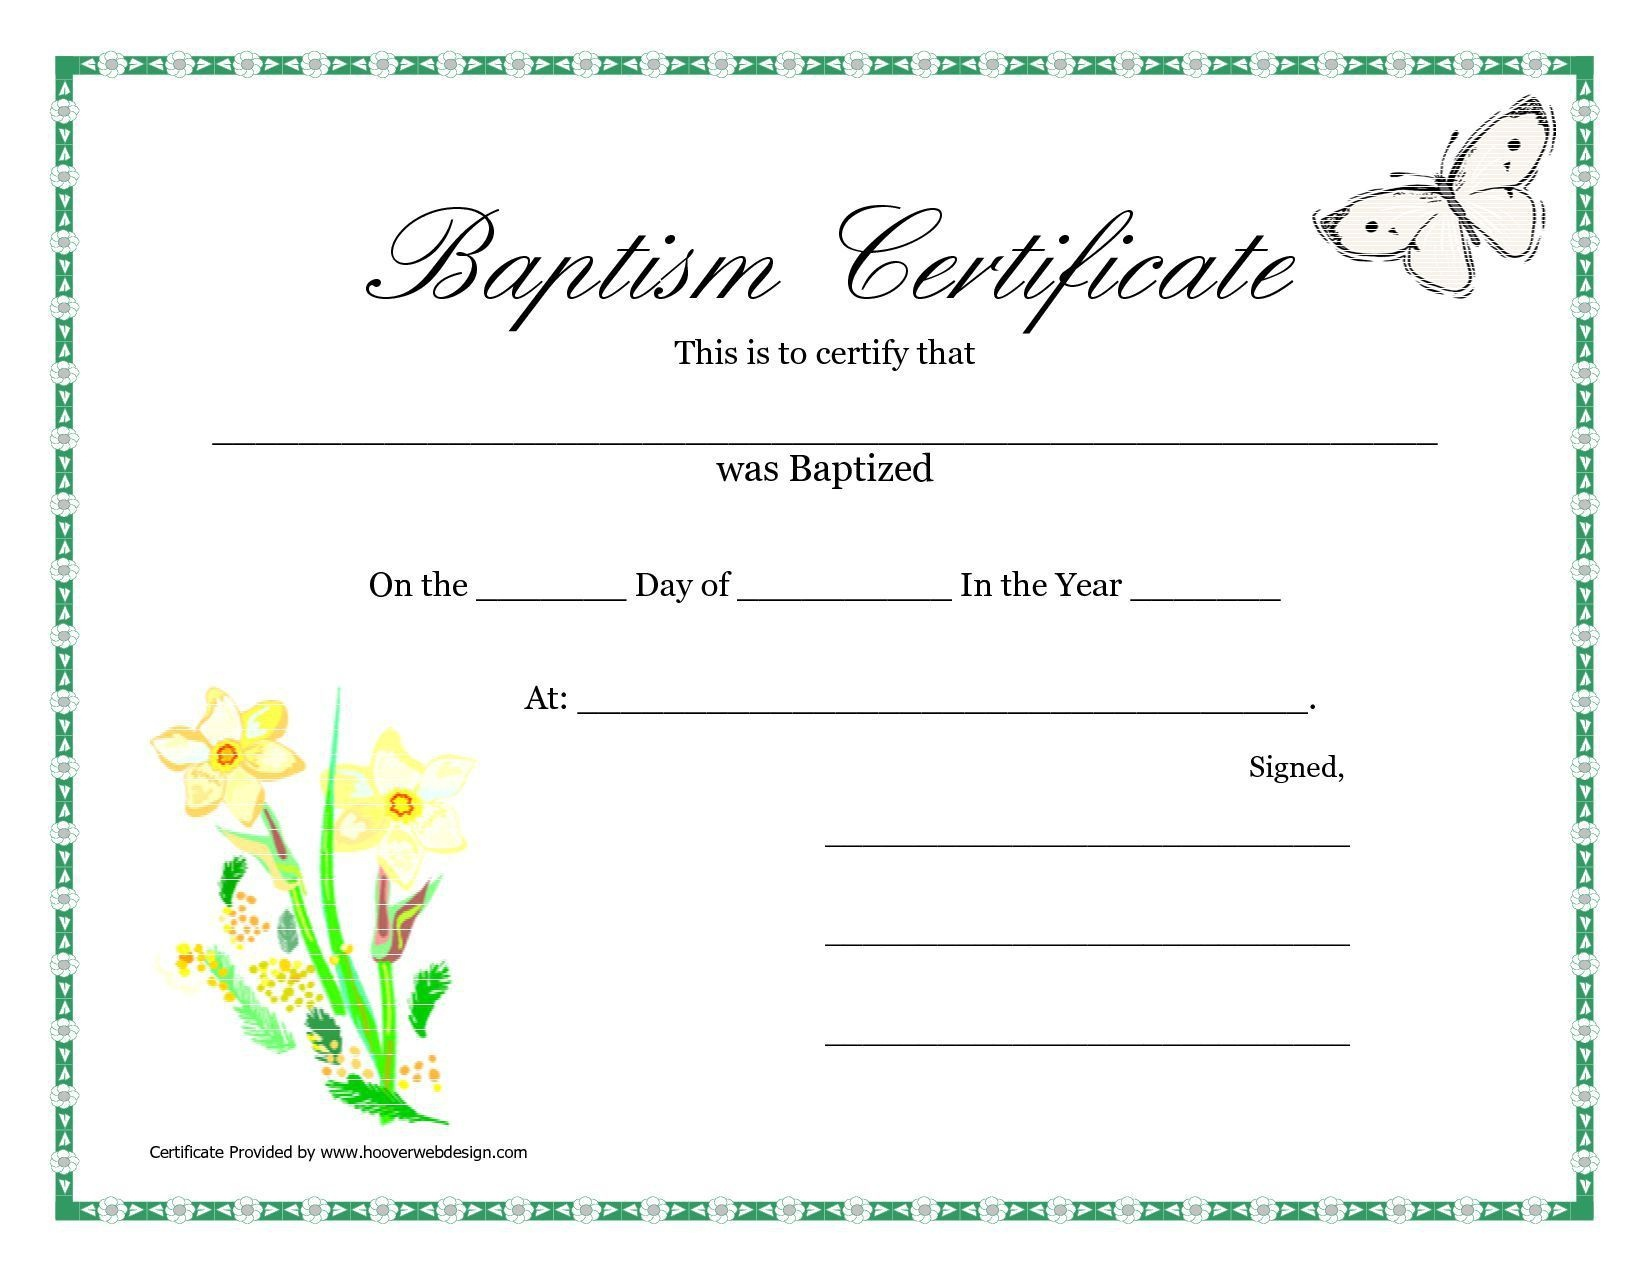 Baptism Invitation : Printable Baptism Invitations - Free Invitation - Free Online Printable Baptism Certificates